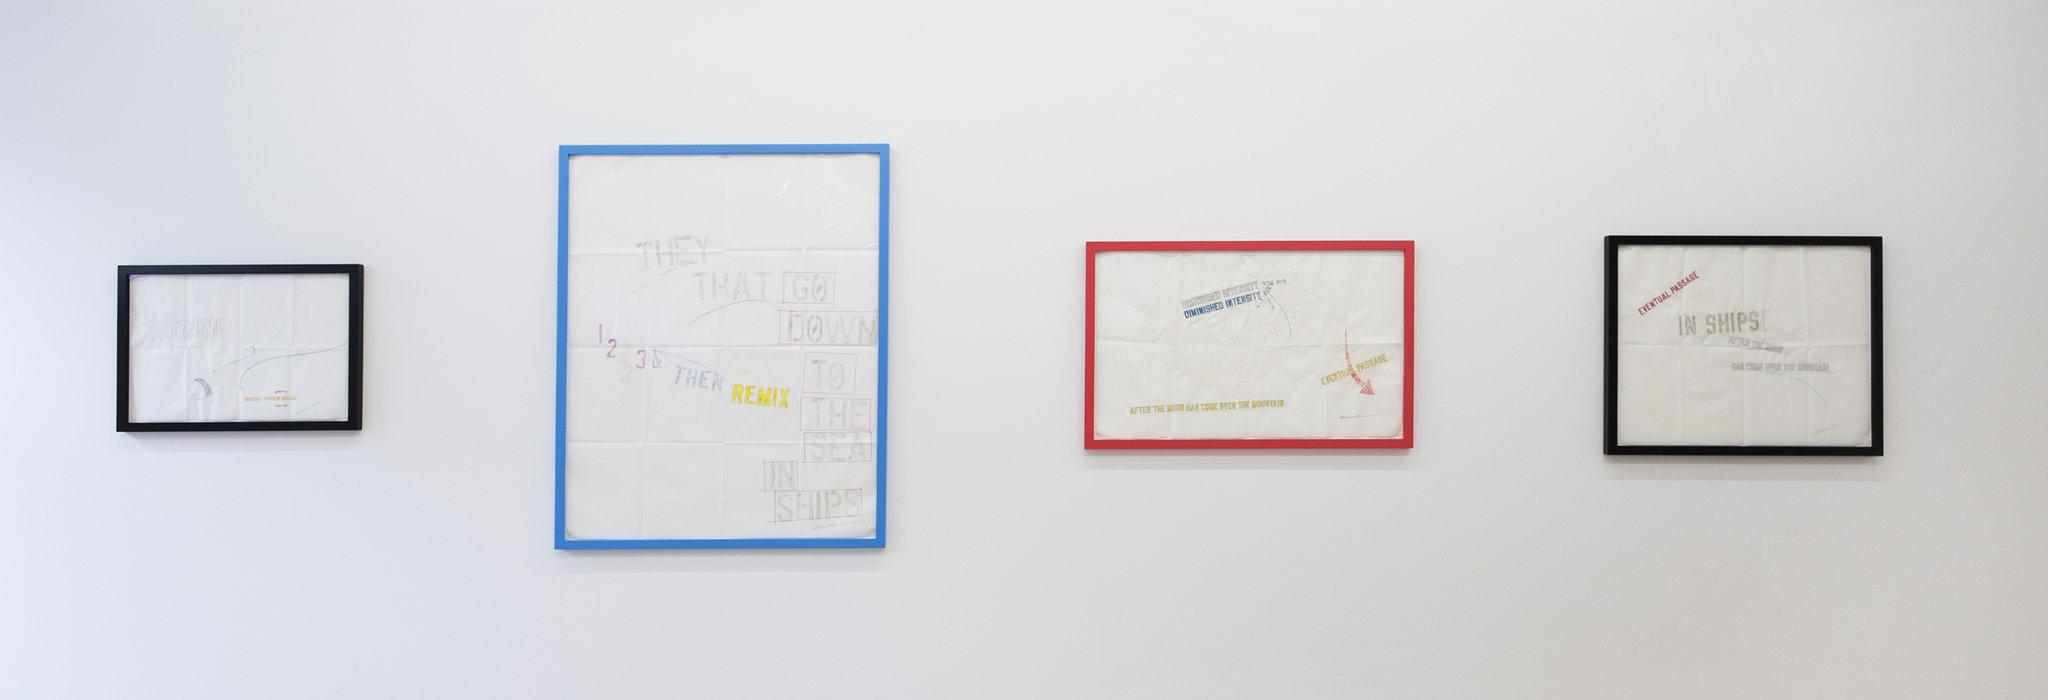 TARO NASU那須太郎は話す「60年代のコンセプチュアル・アートを抜きに、現代美術を本当に理解できるのか疑問なのです」_image